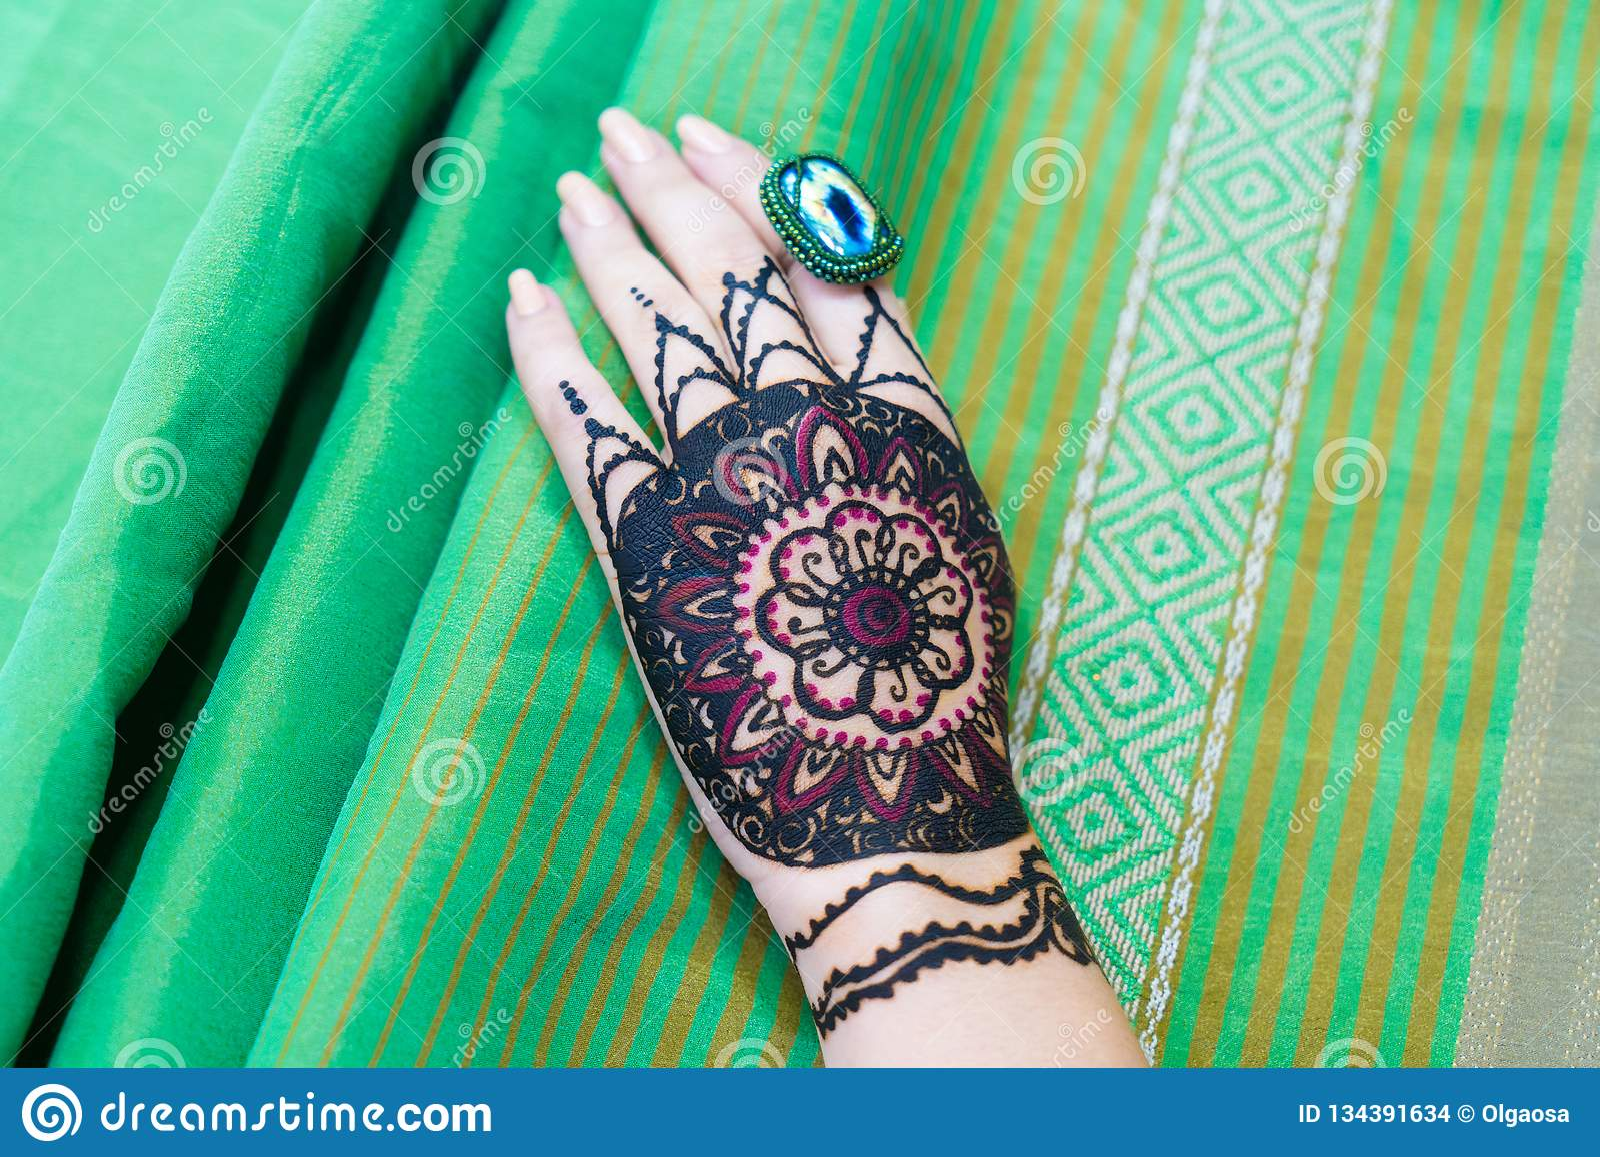 Drawing Henna Mandala On Woman Hand Stock Photo Image Of Bright